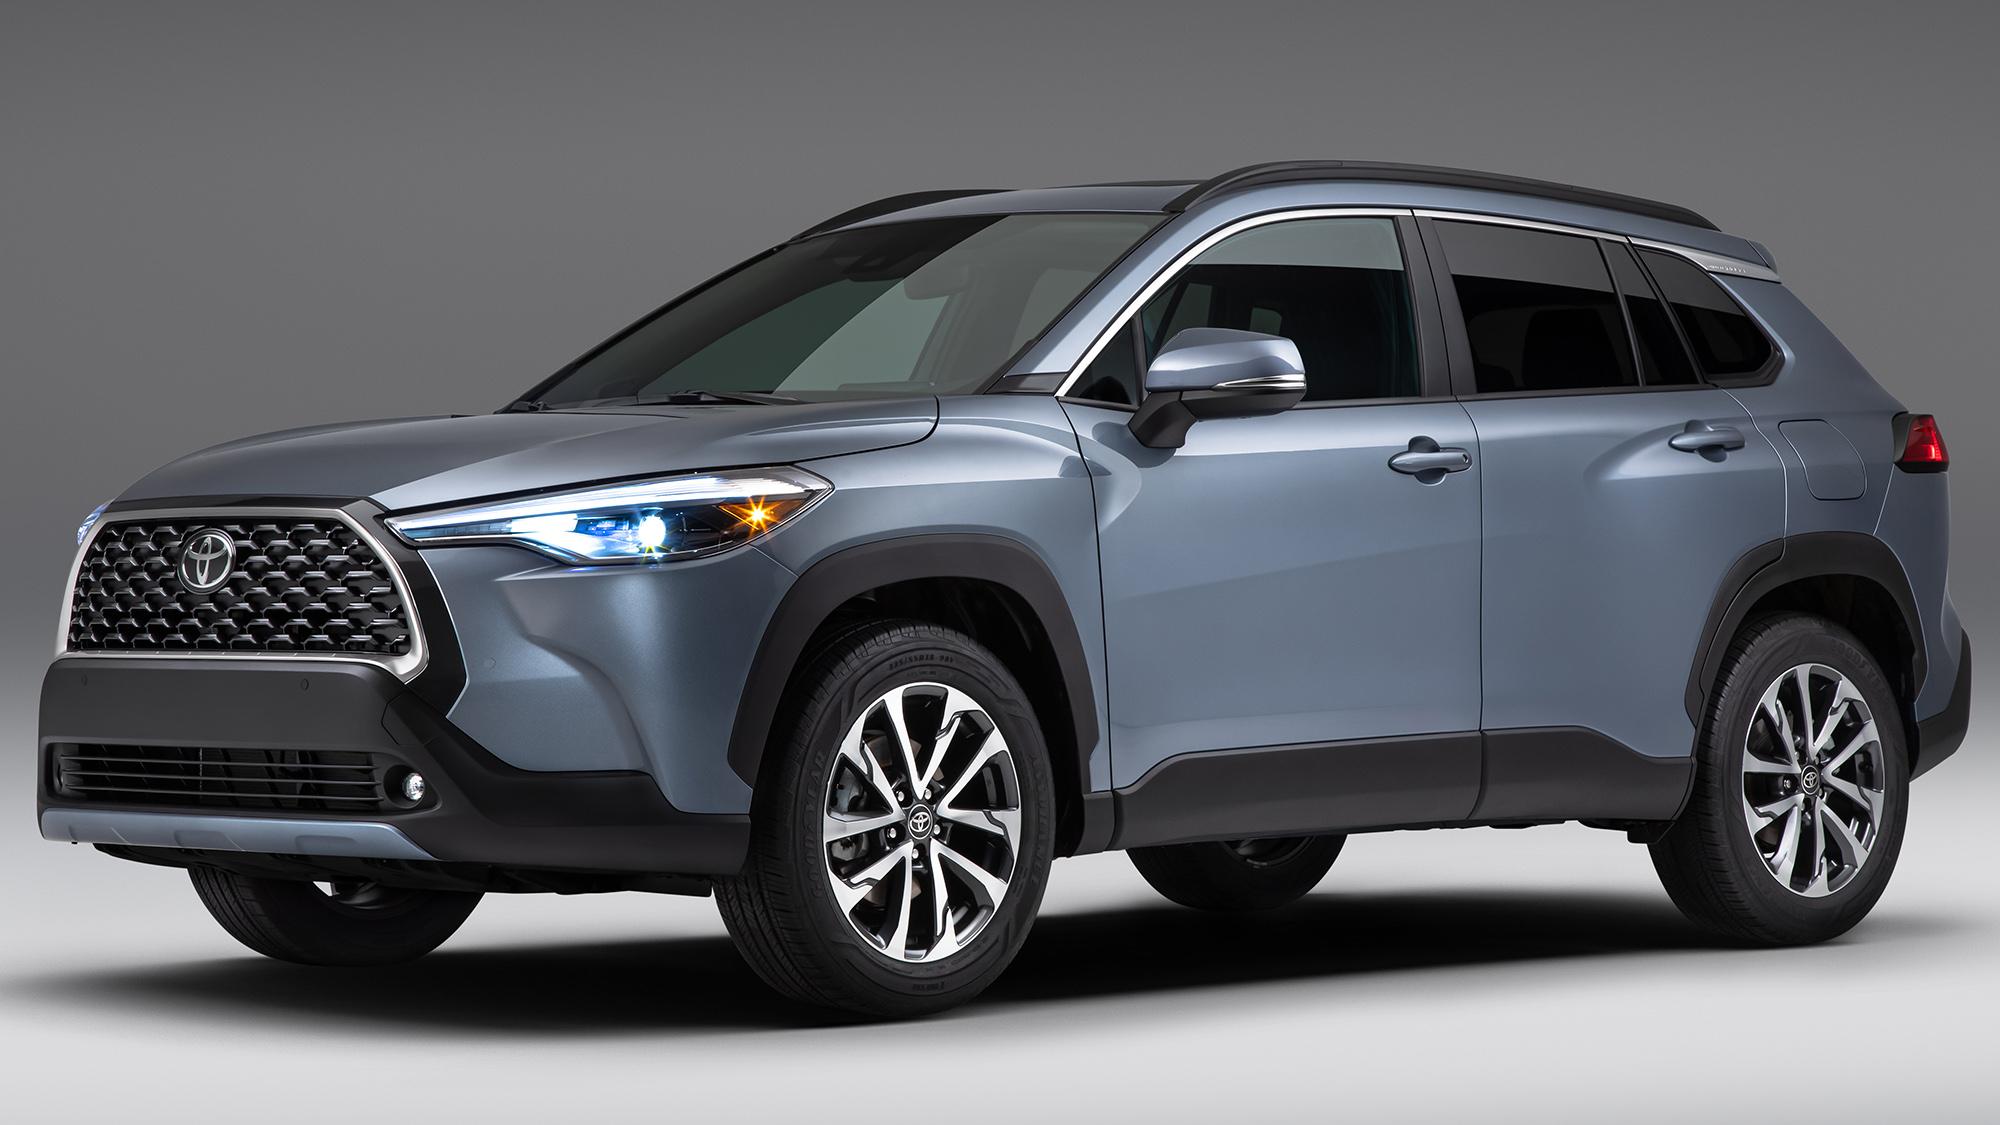 Toyota Corolla Cross 2022 cinza visto 3/4 de frente